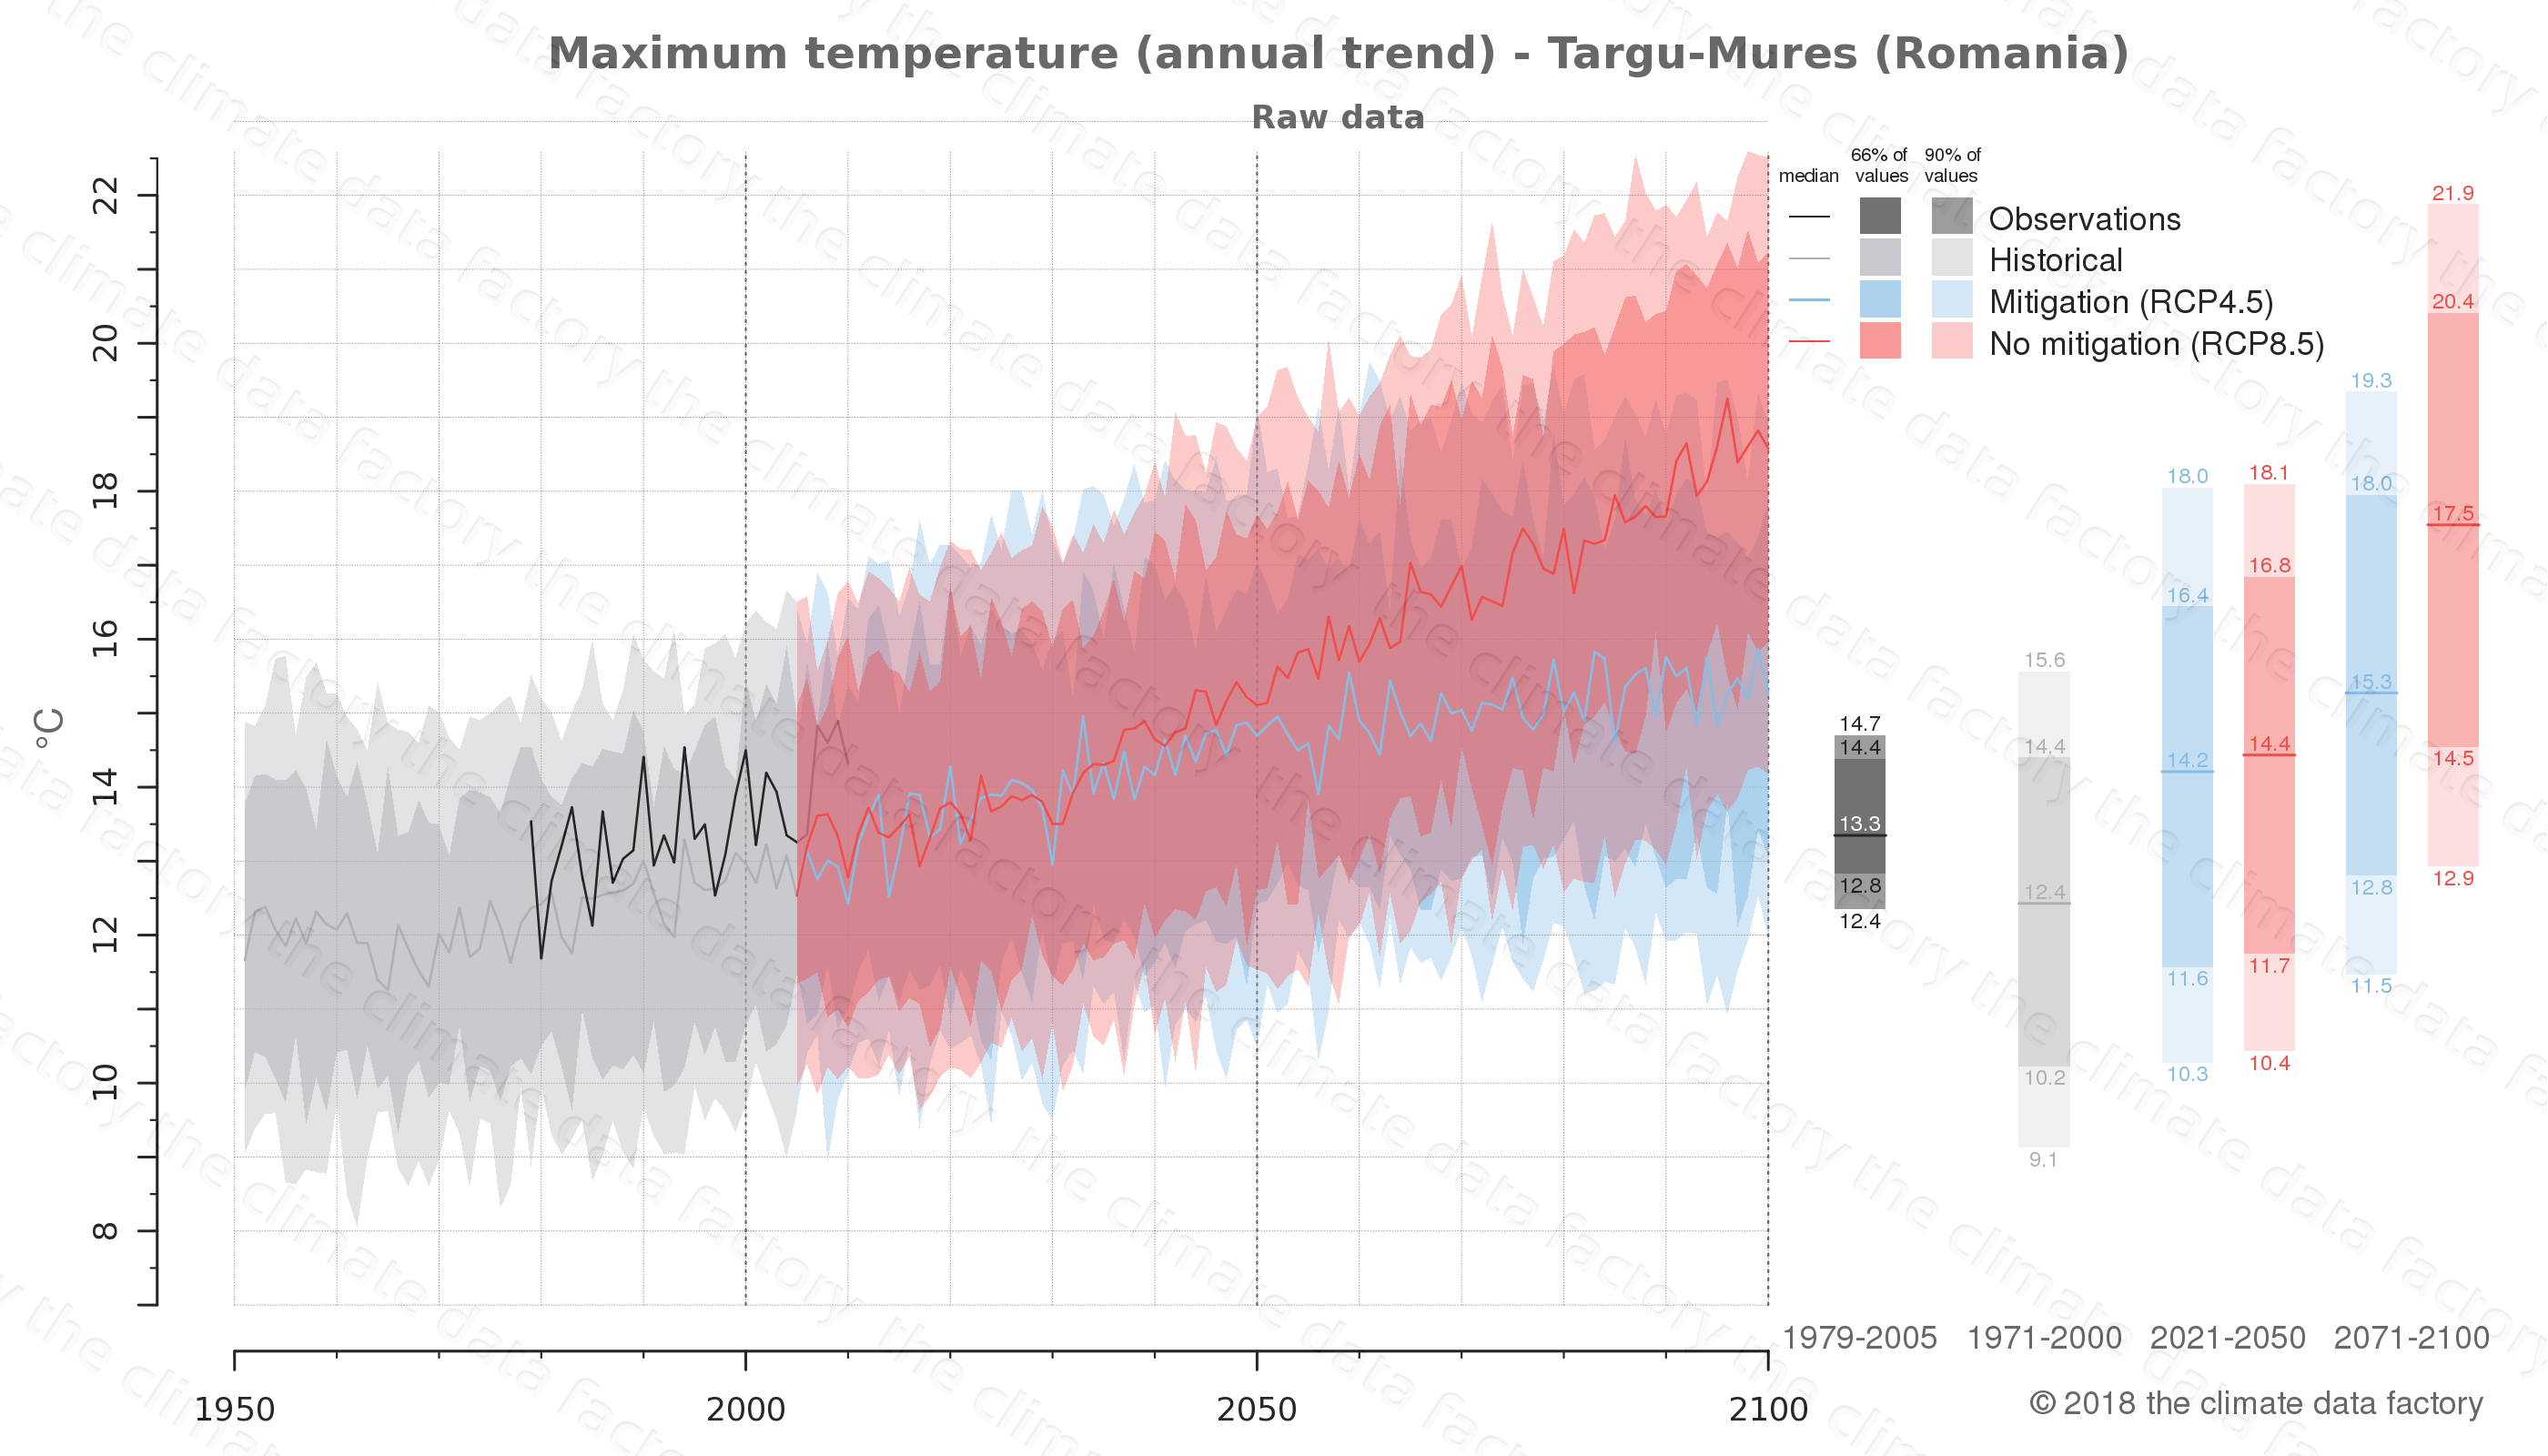 climate change data policy adaptation climate graph city data maximum-temperature targu-mures romania